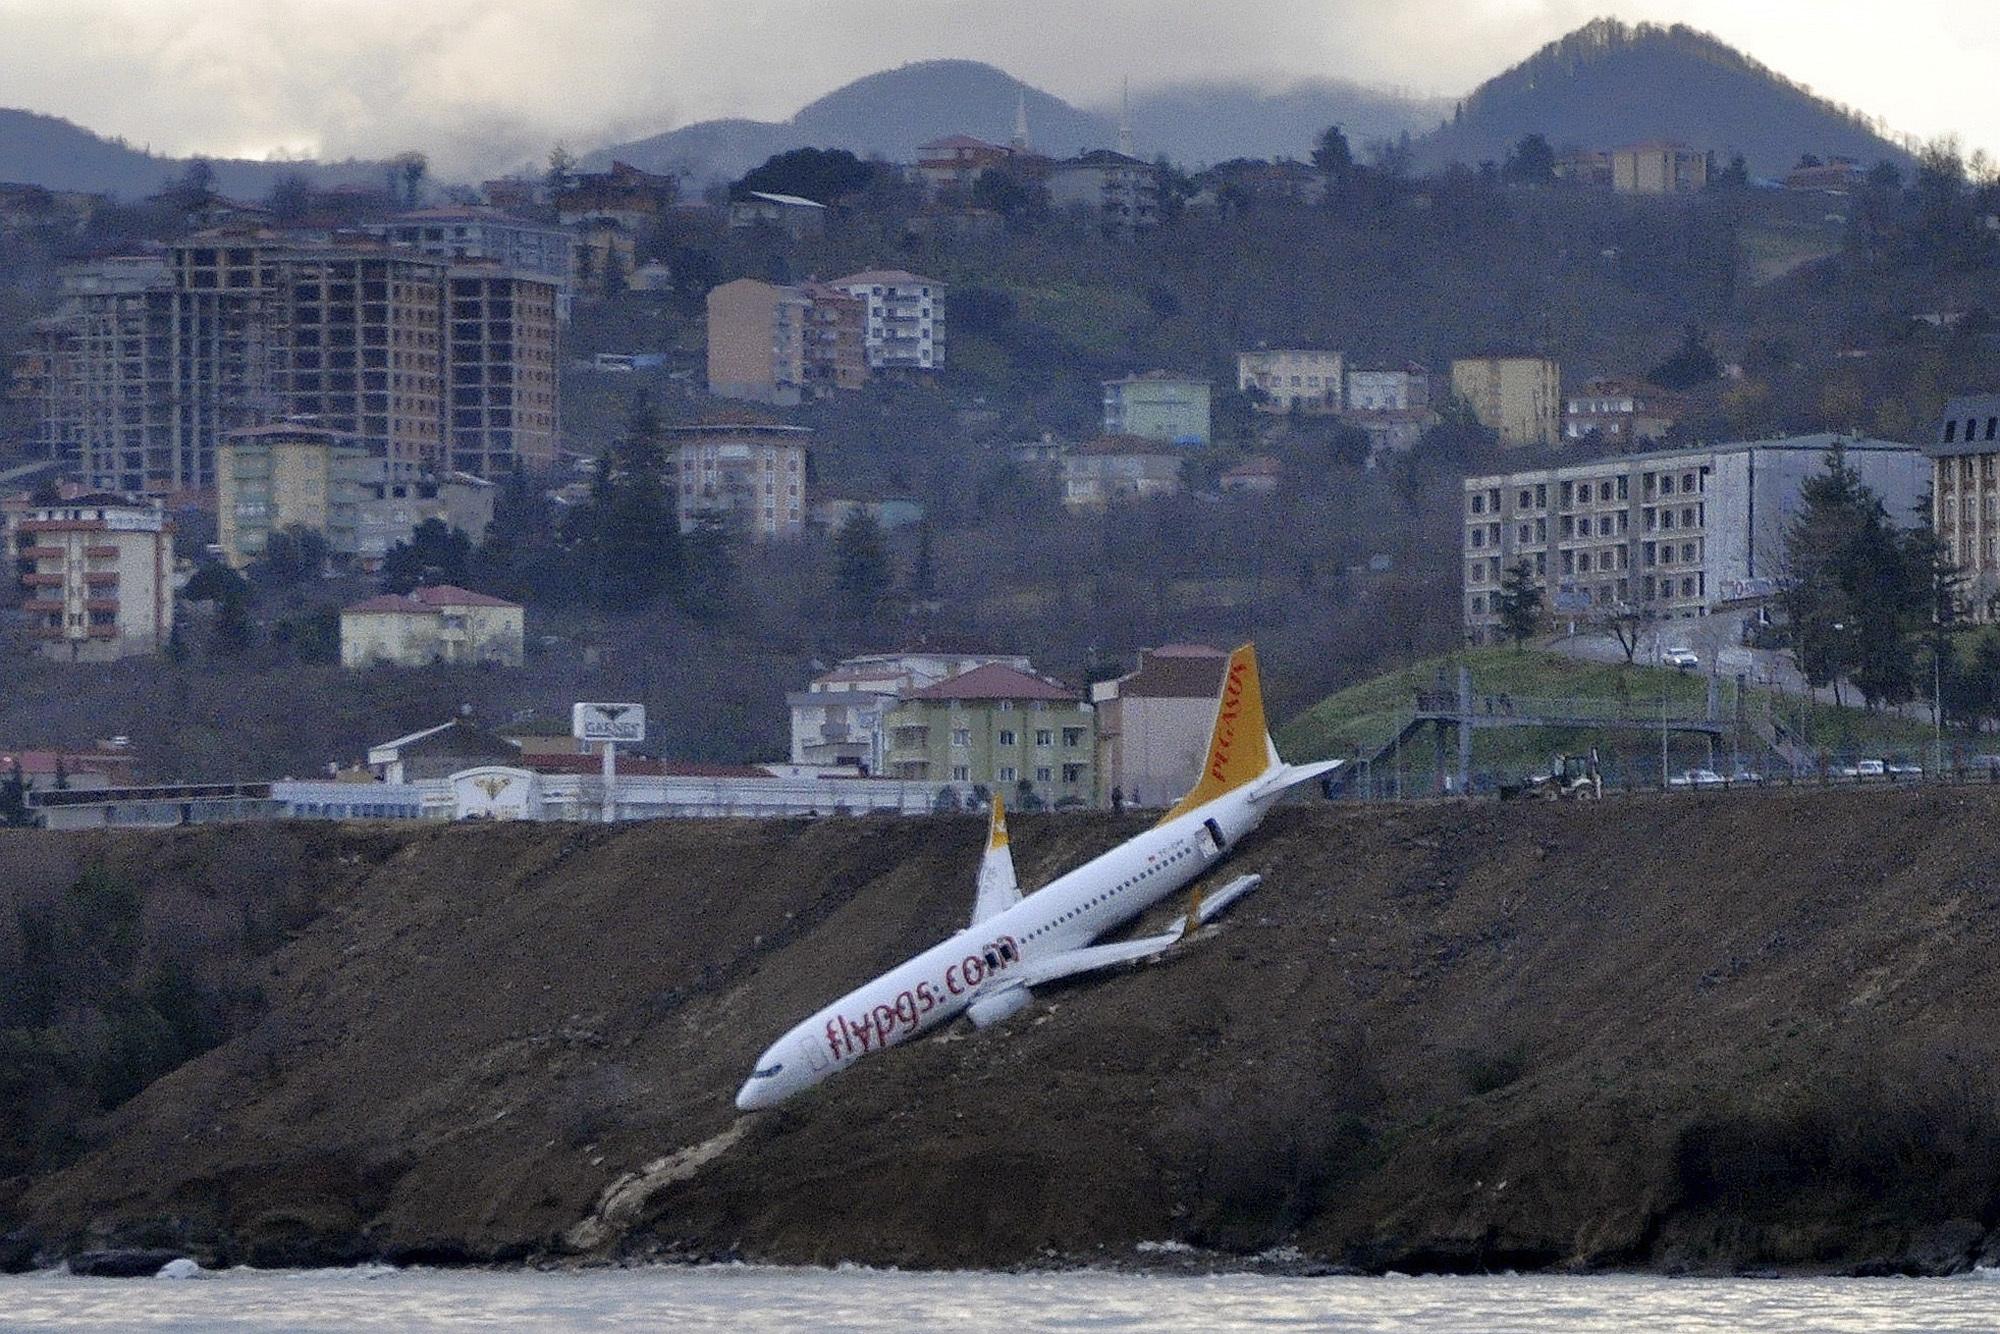 Turkey_Plane_24984-159532.jpg83080869